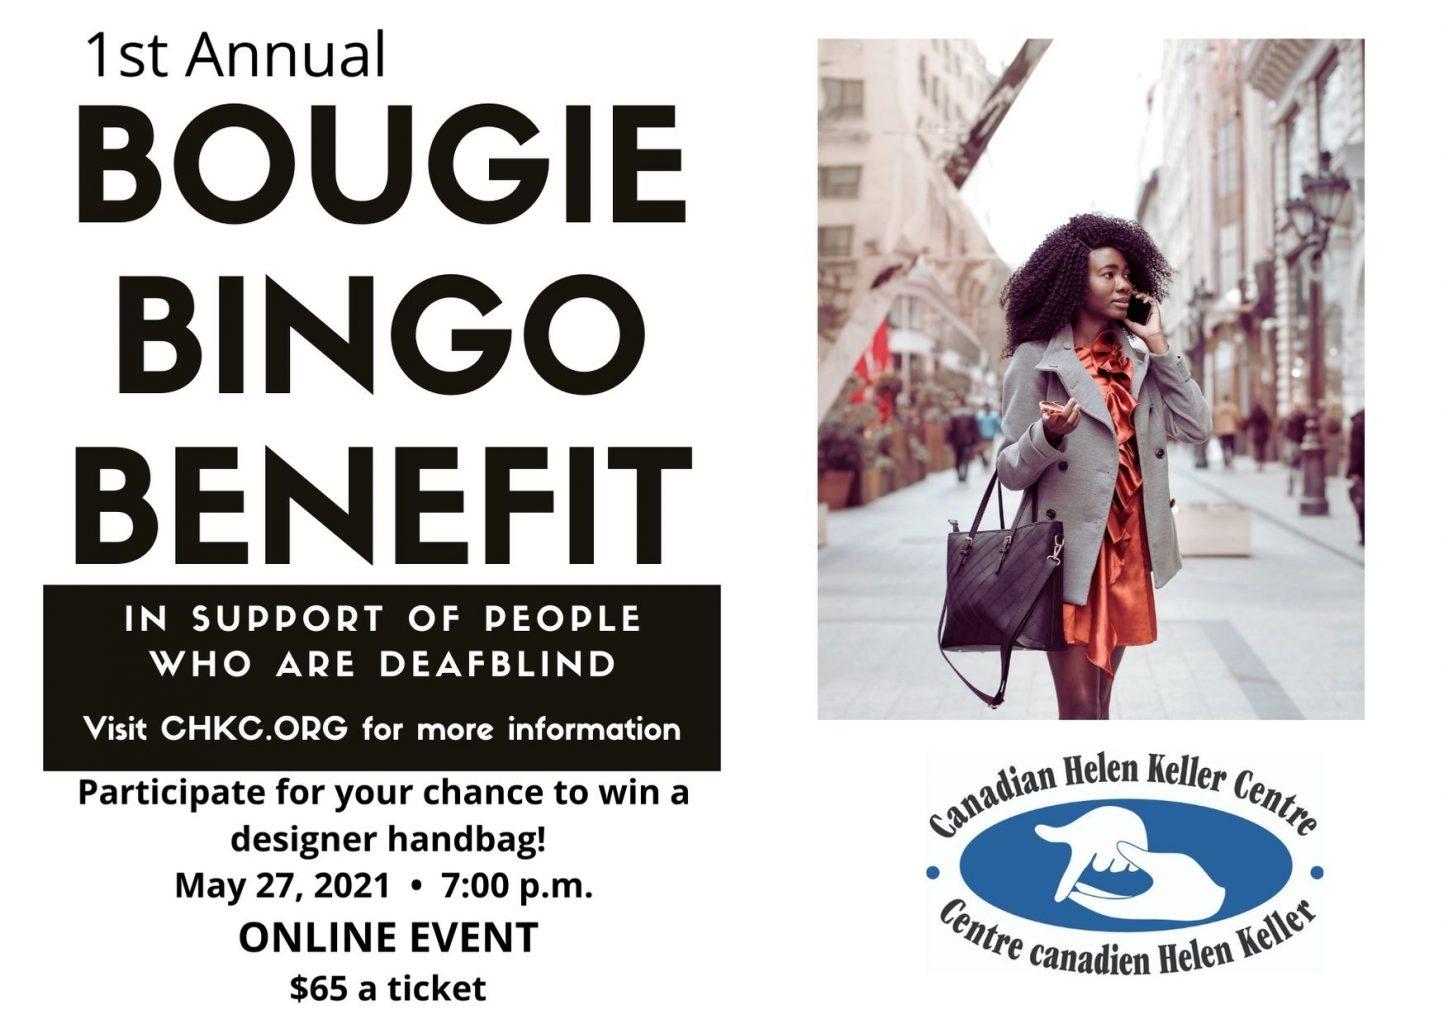 Bougie Bingo Online Event Maybe 27, 2021